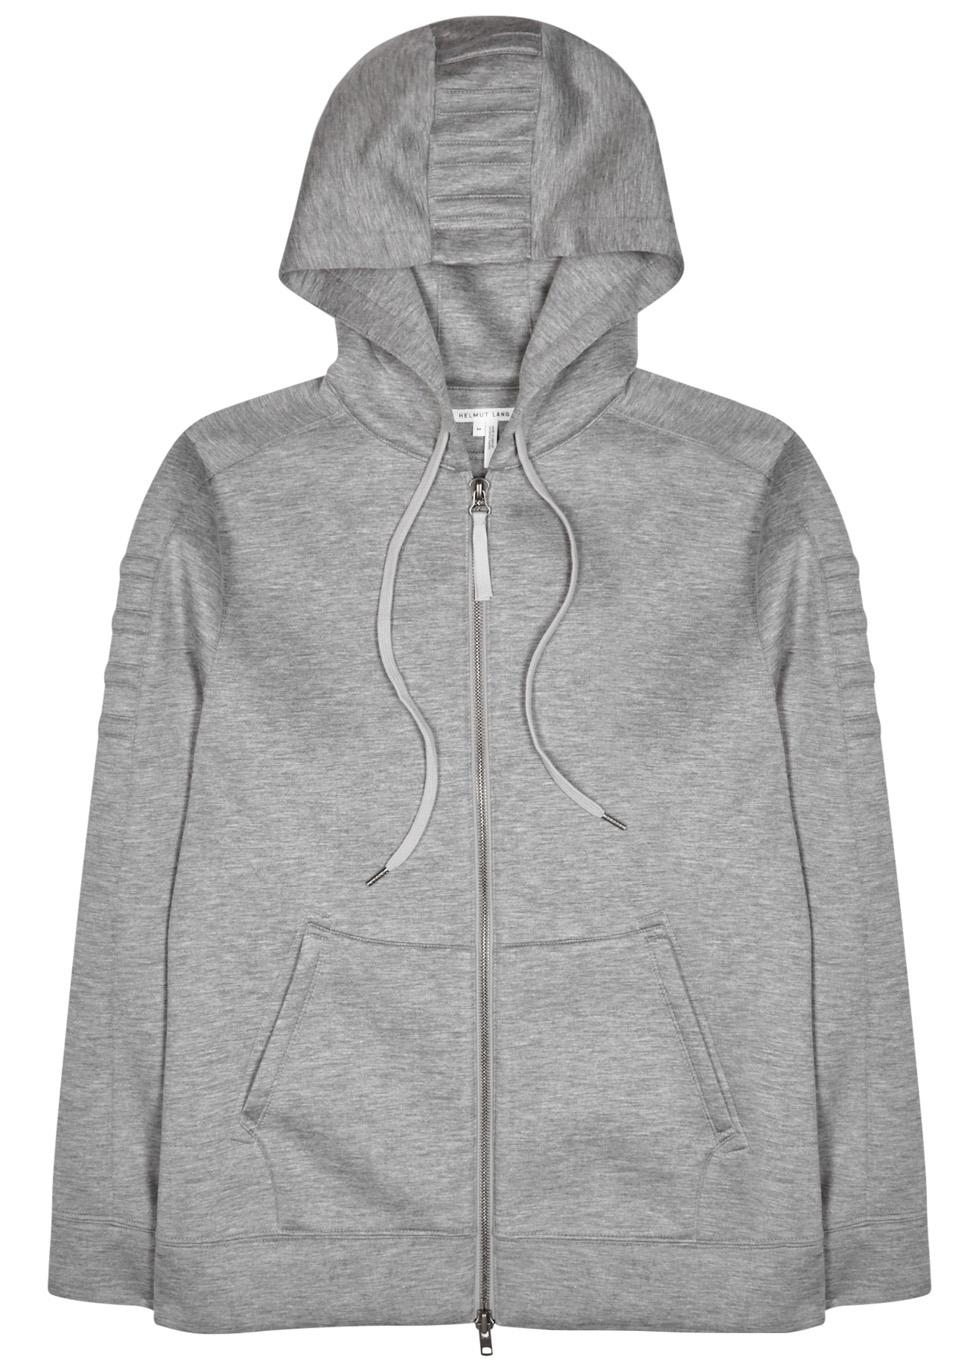 Grey hooded modal sweatshirt - Helmut Lang